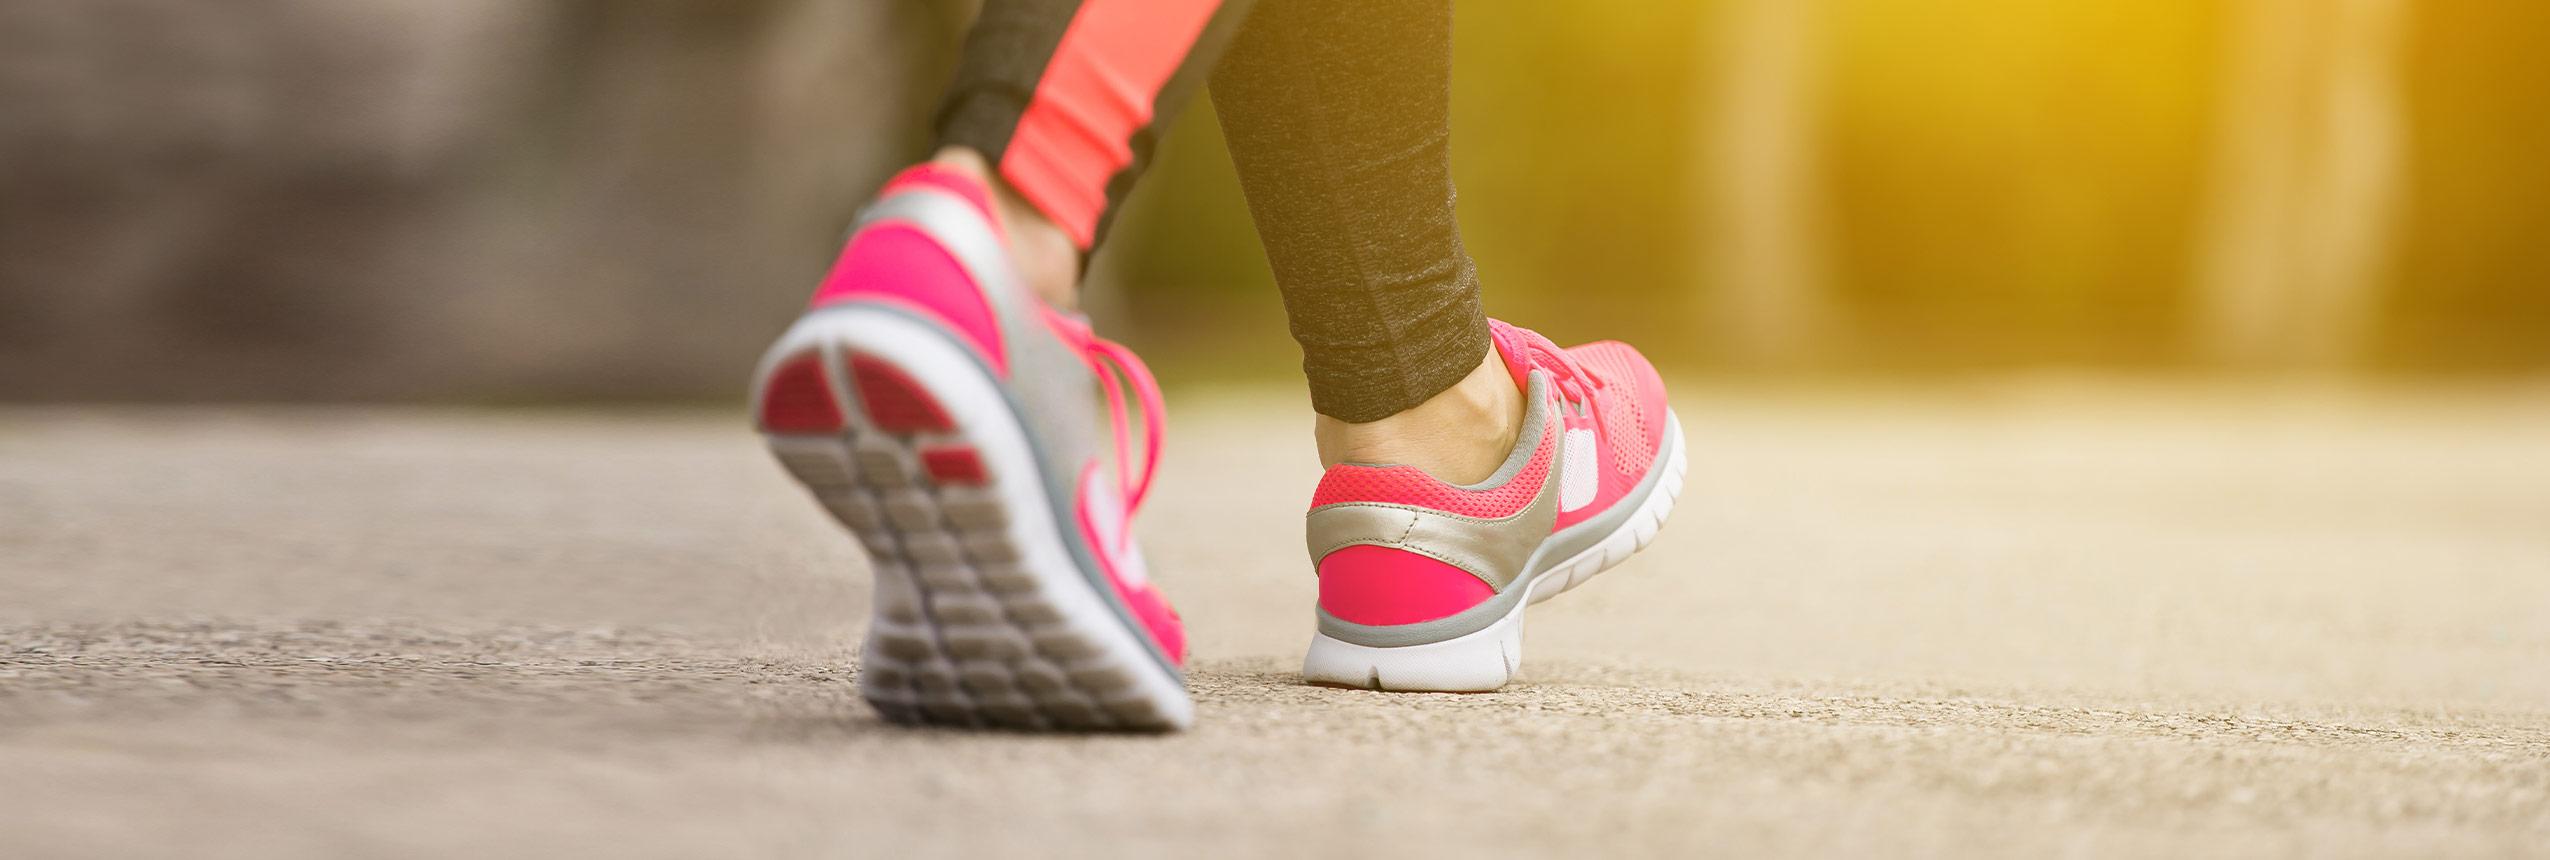 fussschmerzen muenchen orthopaede - Fußschmerzen